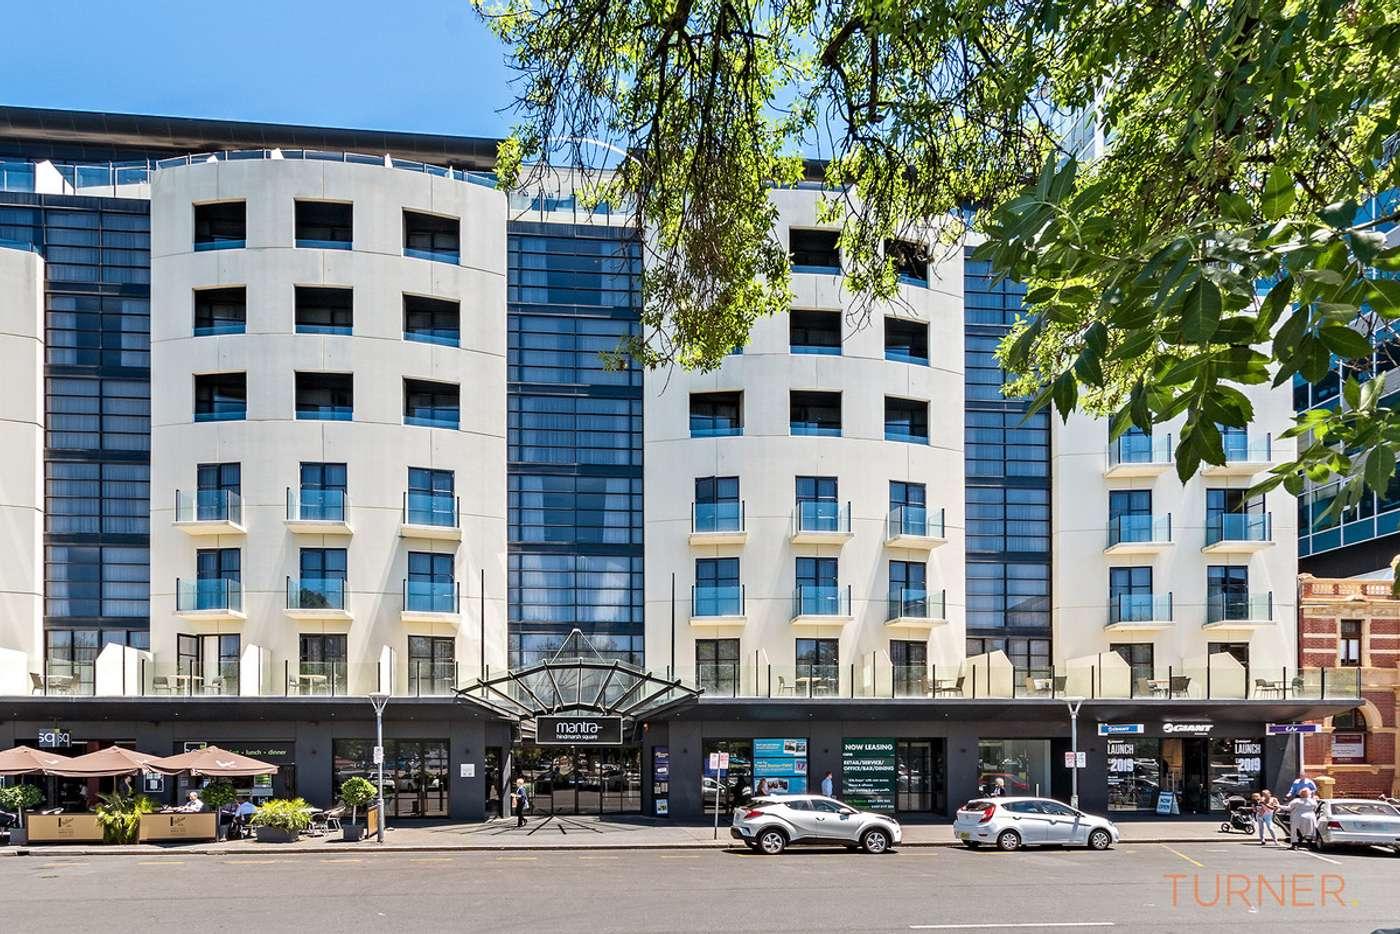 Main view of Homely apartment listing, 410/61 Hindmarsh Square, Adelaide SA 5000